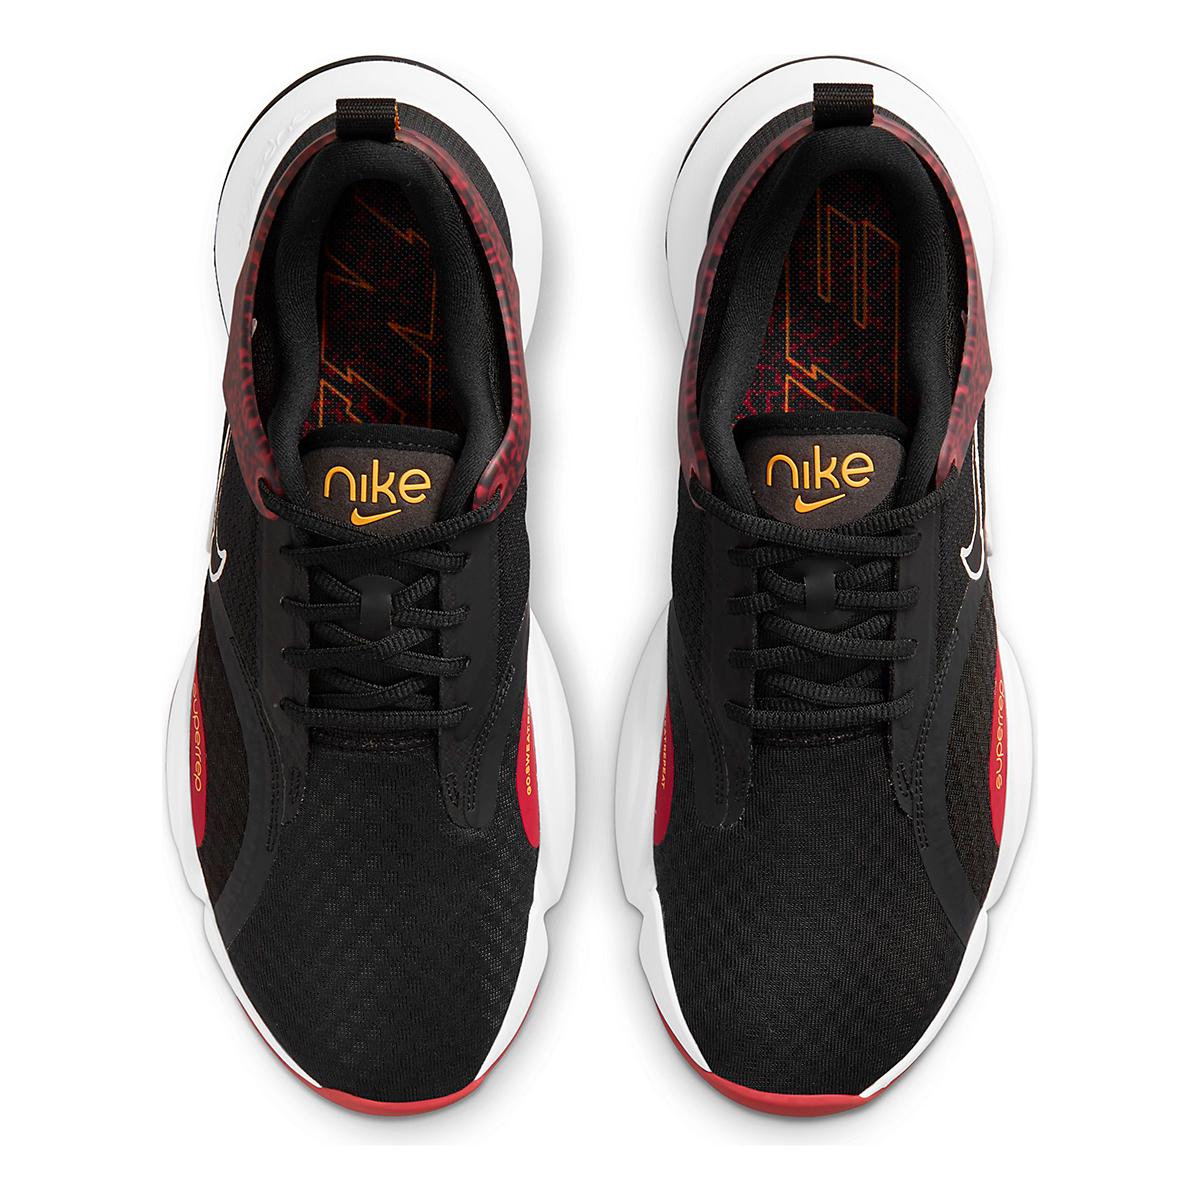 Men's Nike SuperRep Go 2 Training Shoe - Color: Black/White/Dark Cayenne/Solar Flare - Size: 6 - Width: Regular, Black/White/Dark Cayenne/Solar Flare, large, image 6